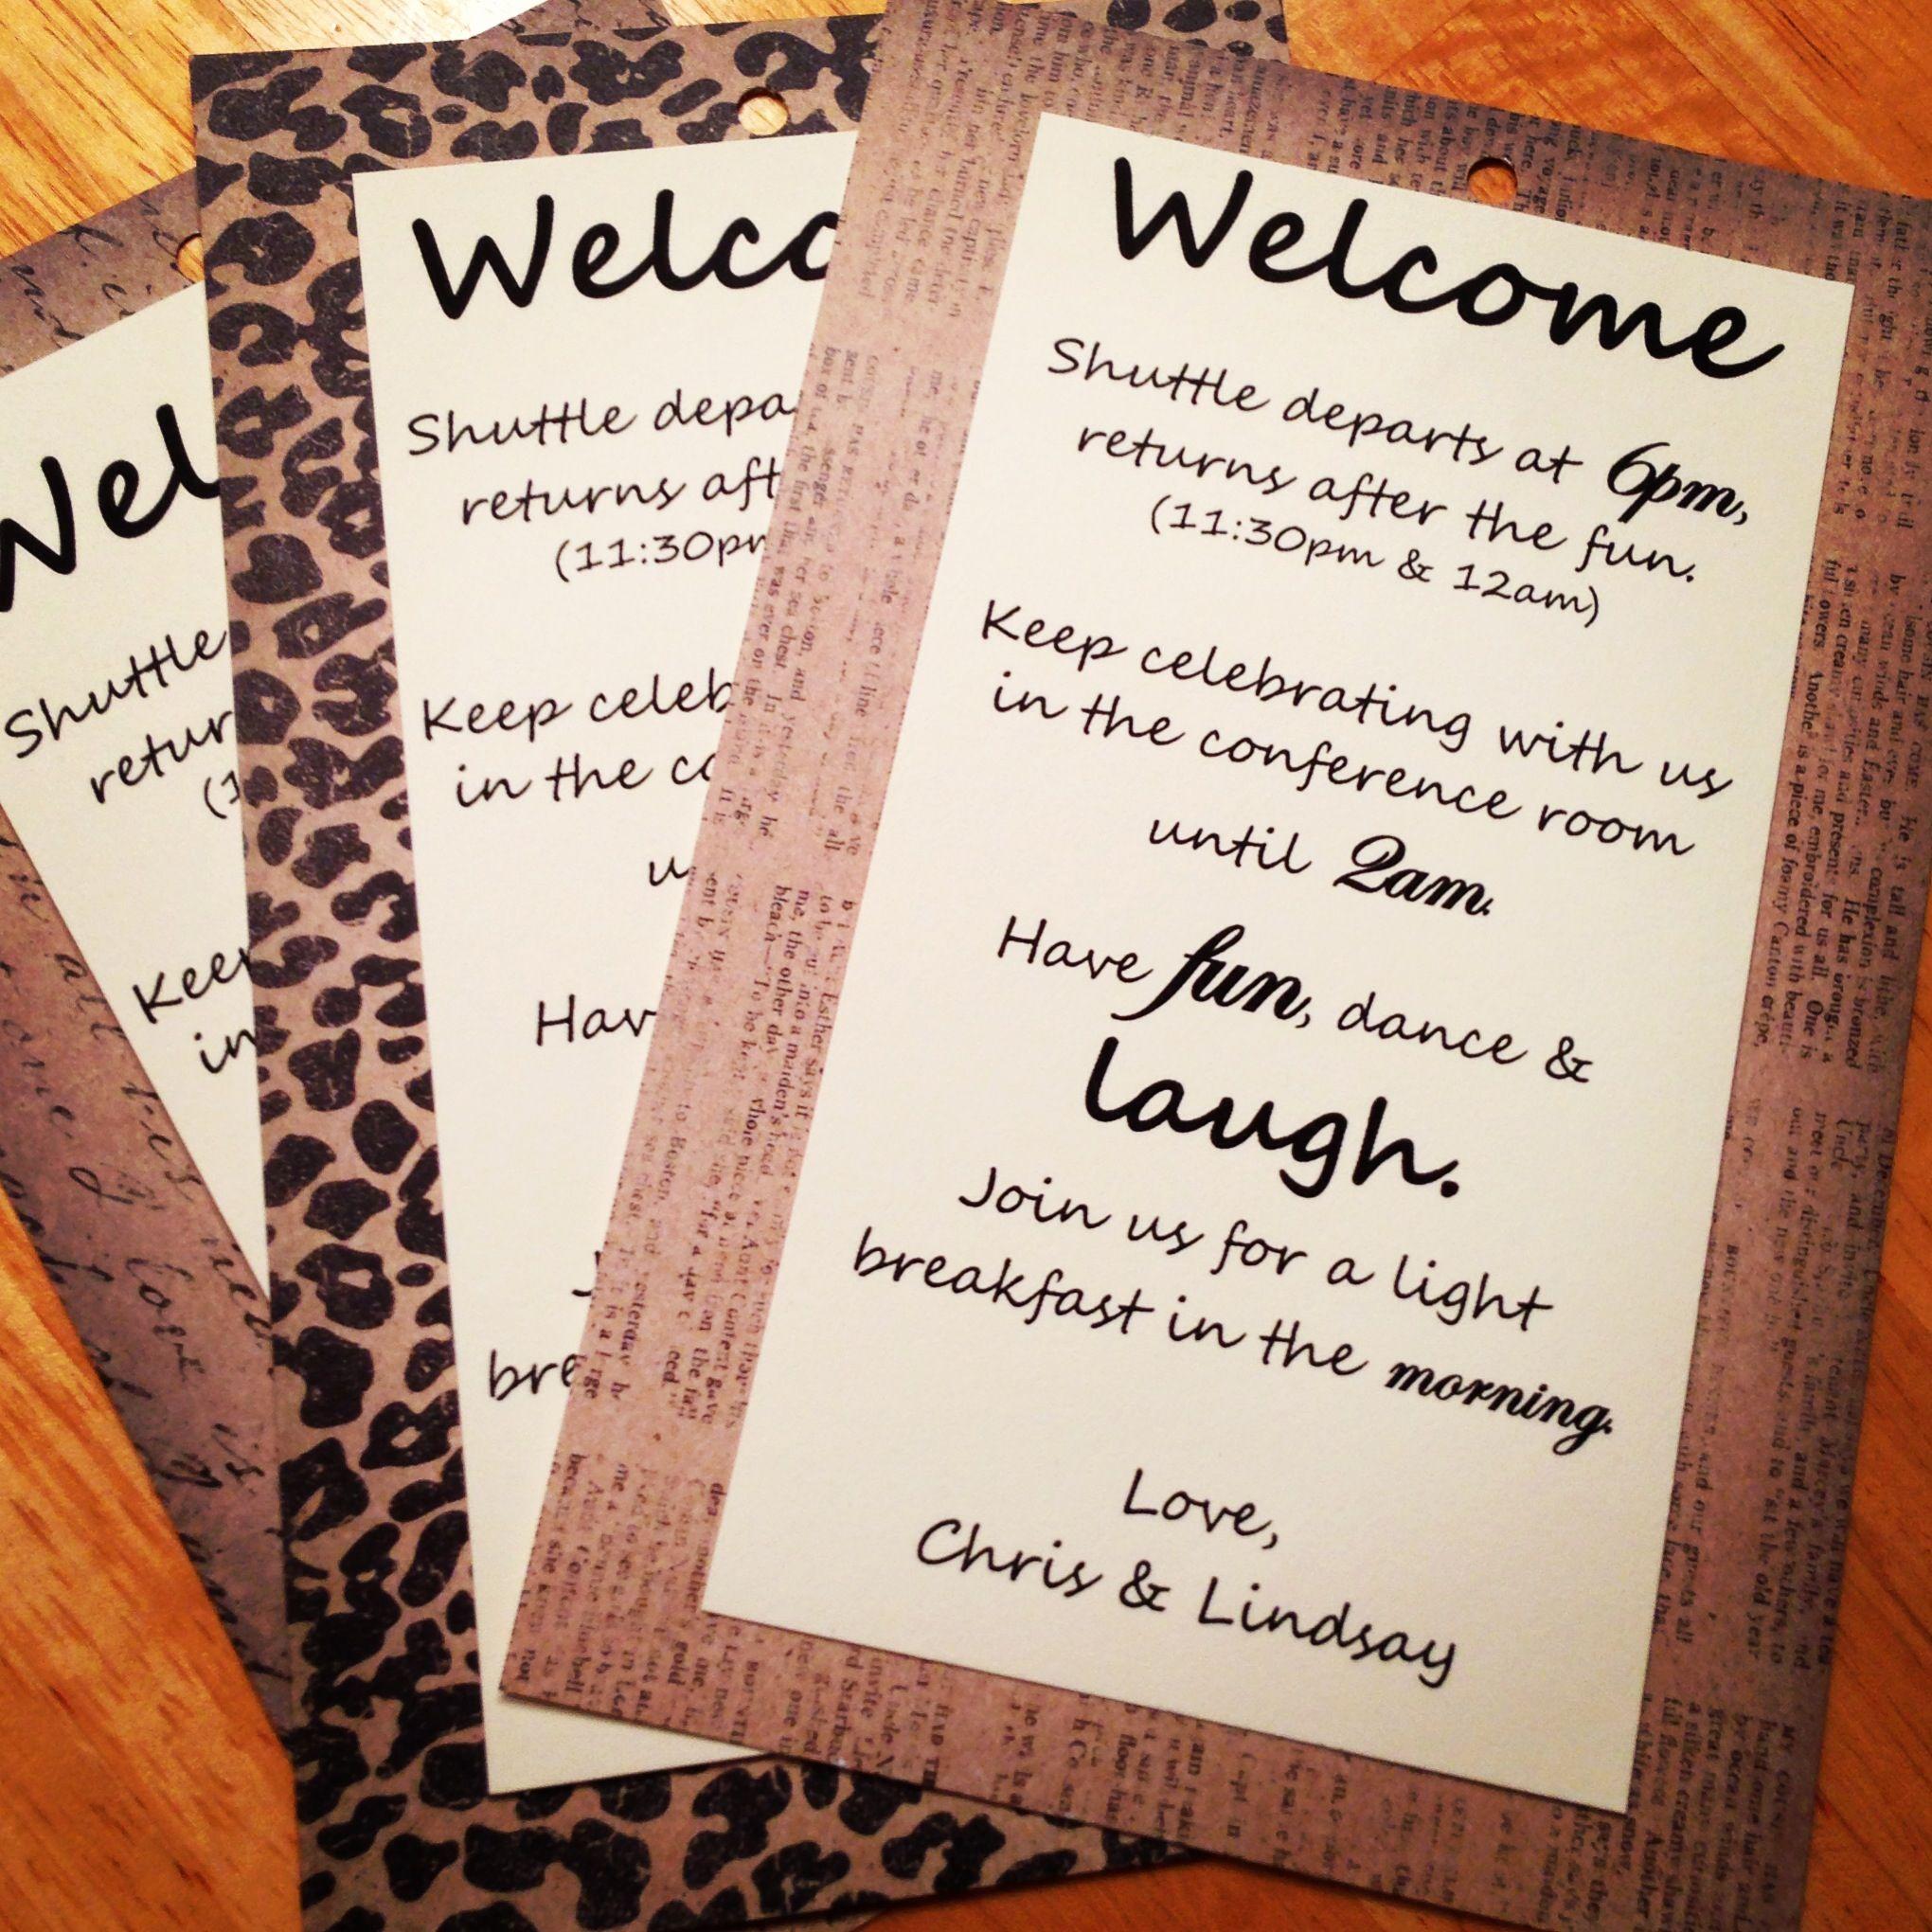 Hotel Gift Bags For Wedding Guests Poem : Hotel Wedding Thank You bag tags. Awsome wedding ideas! Pinterest